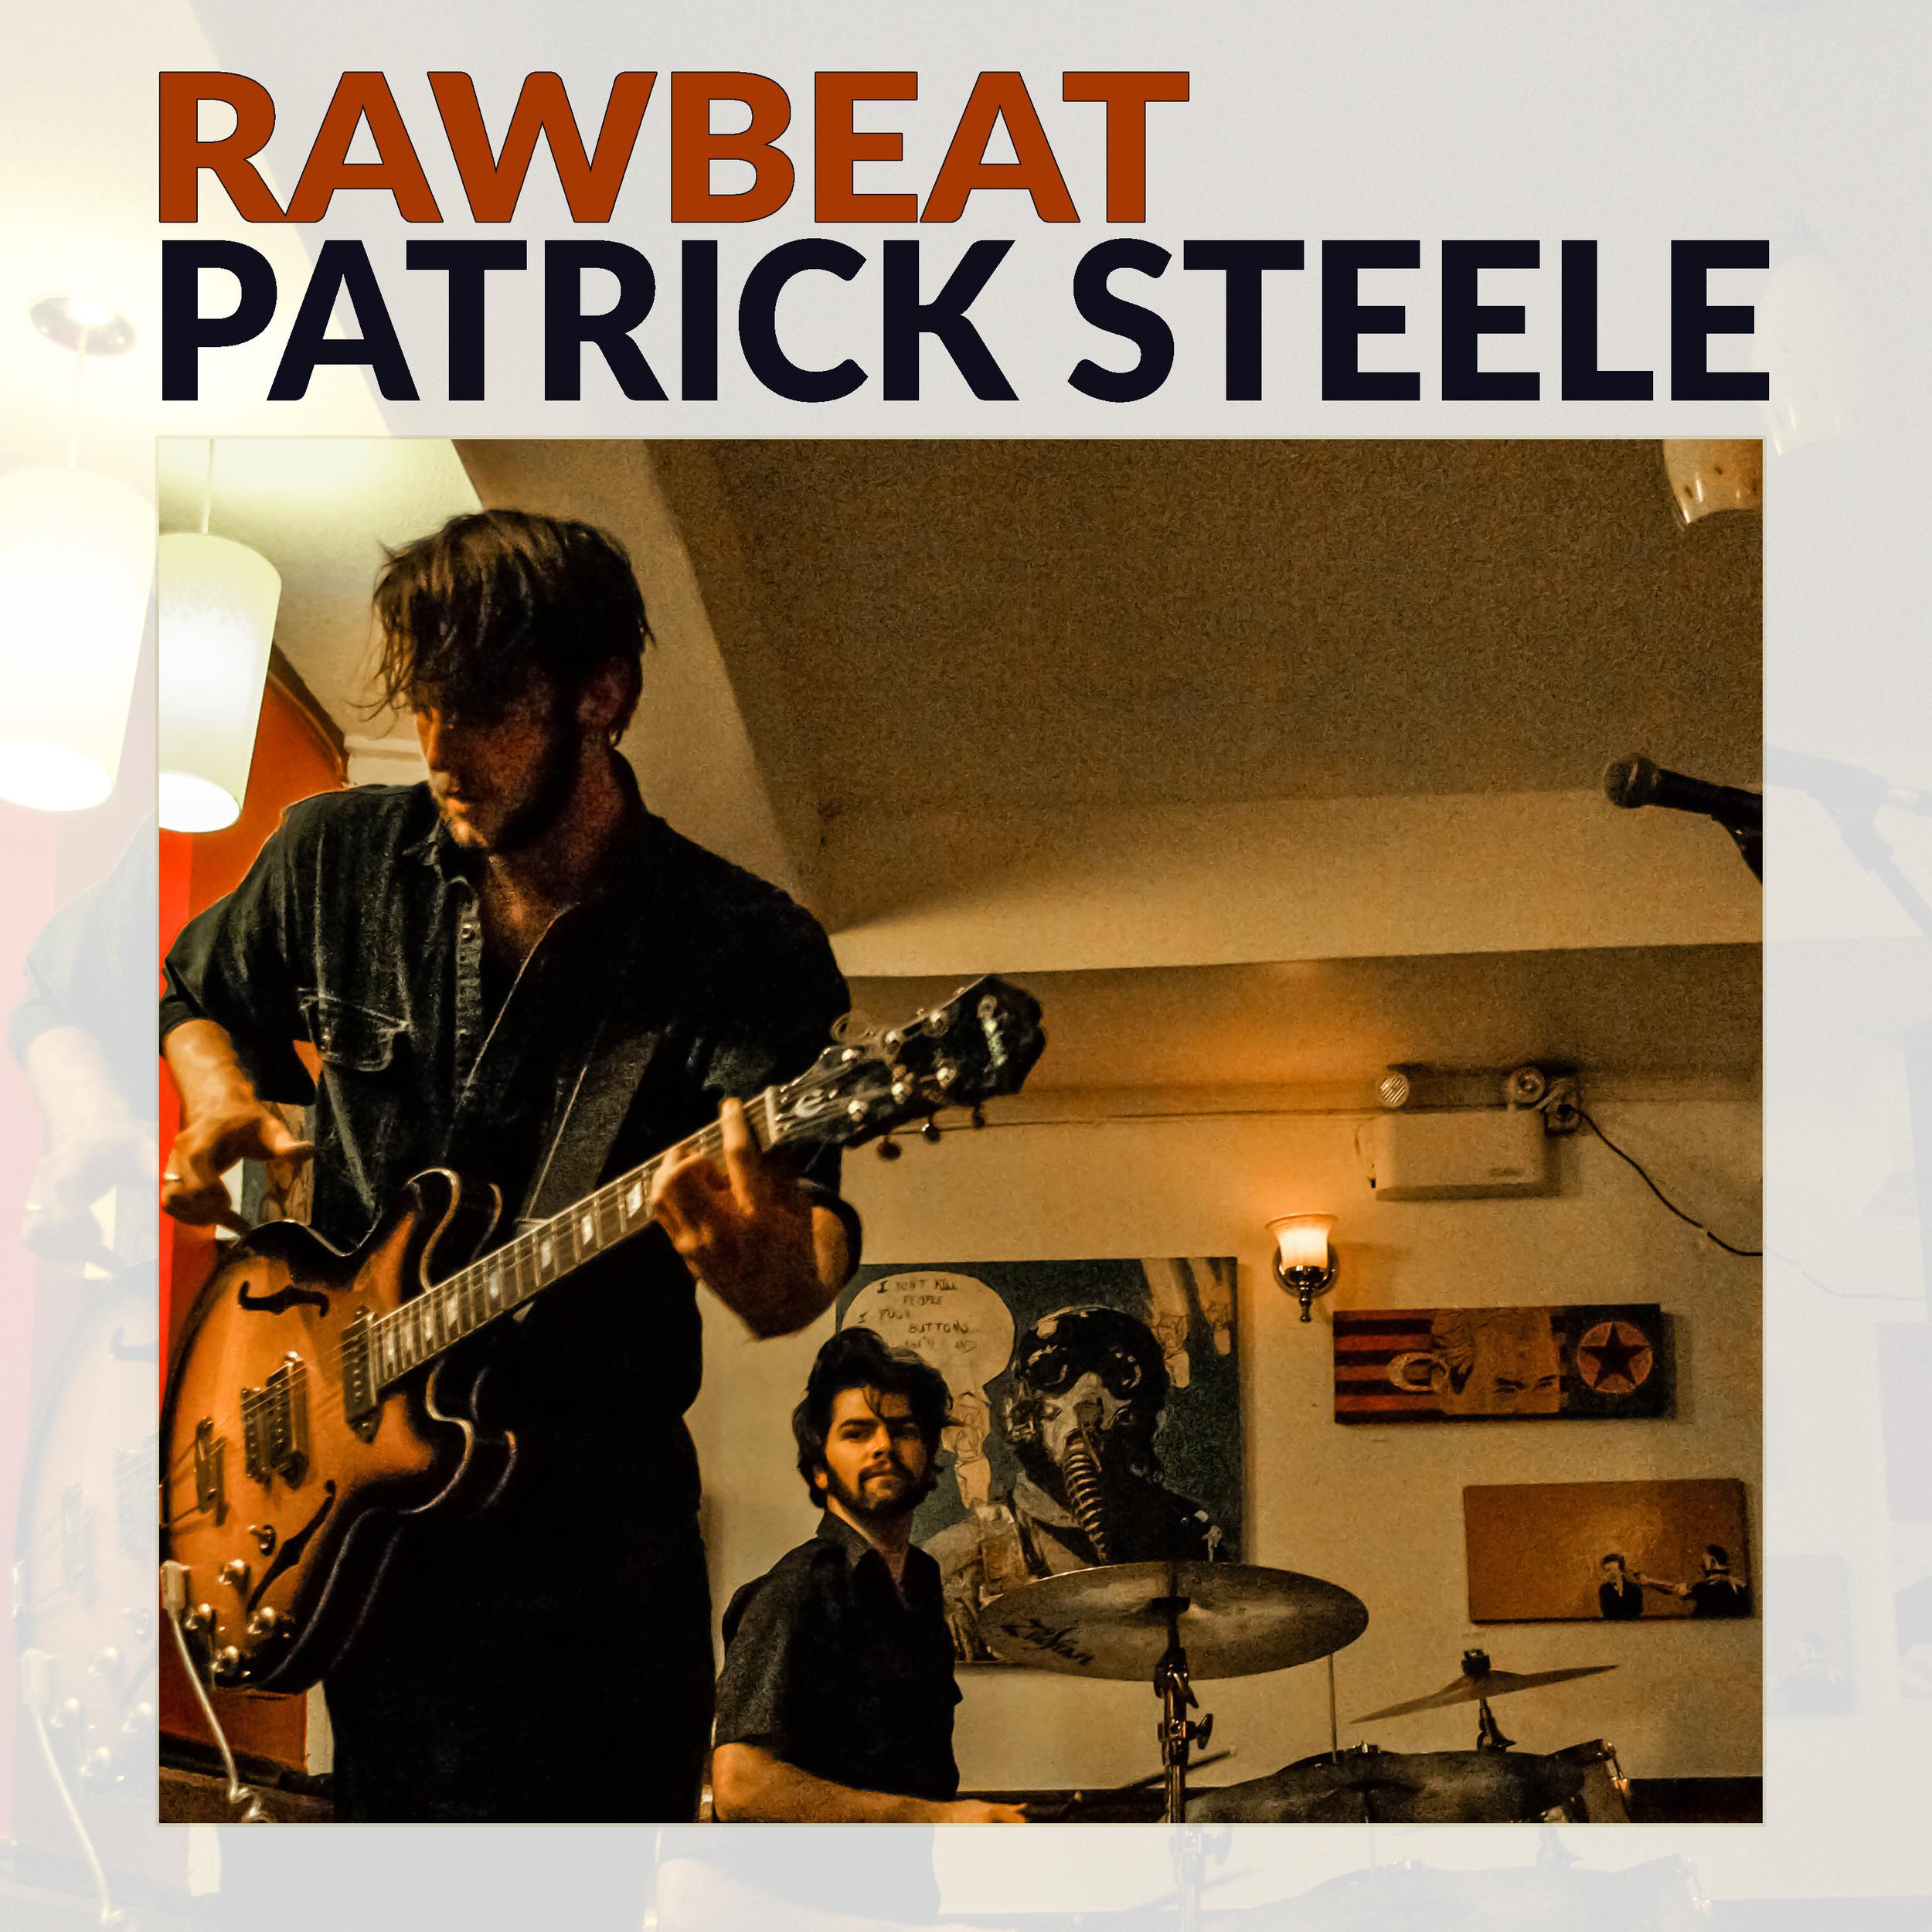 Rawbeat - Patrick Steele